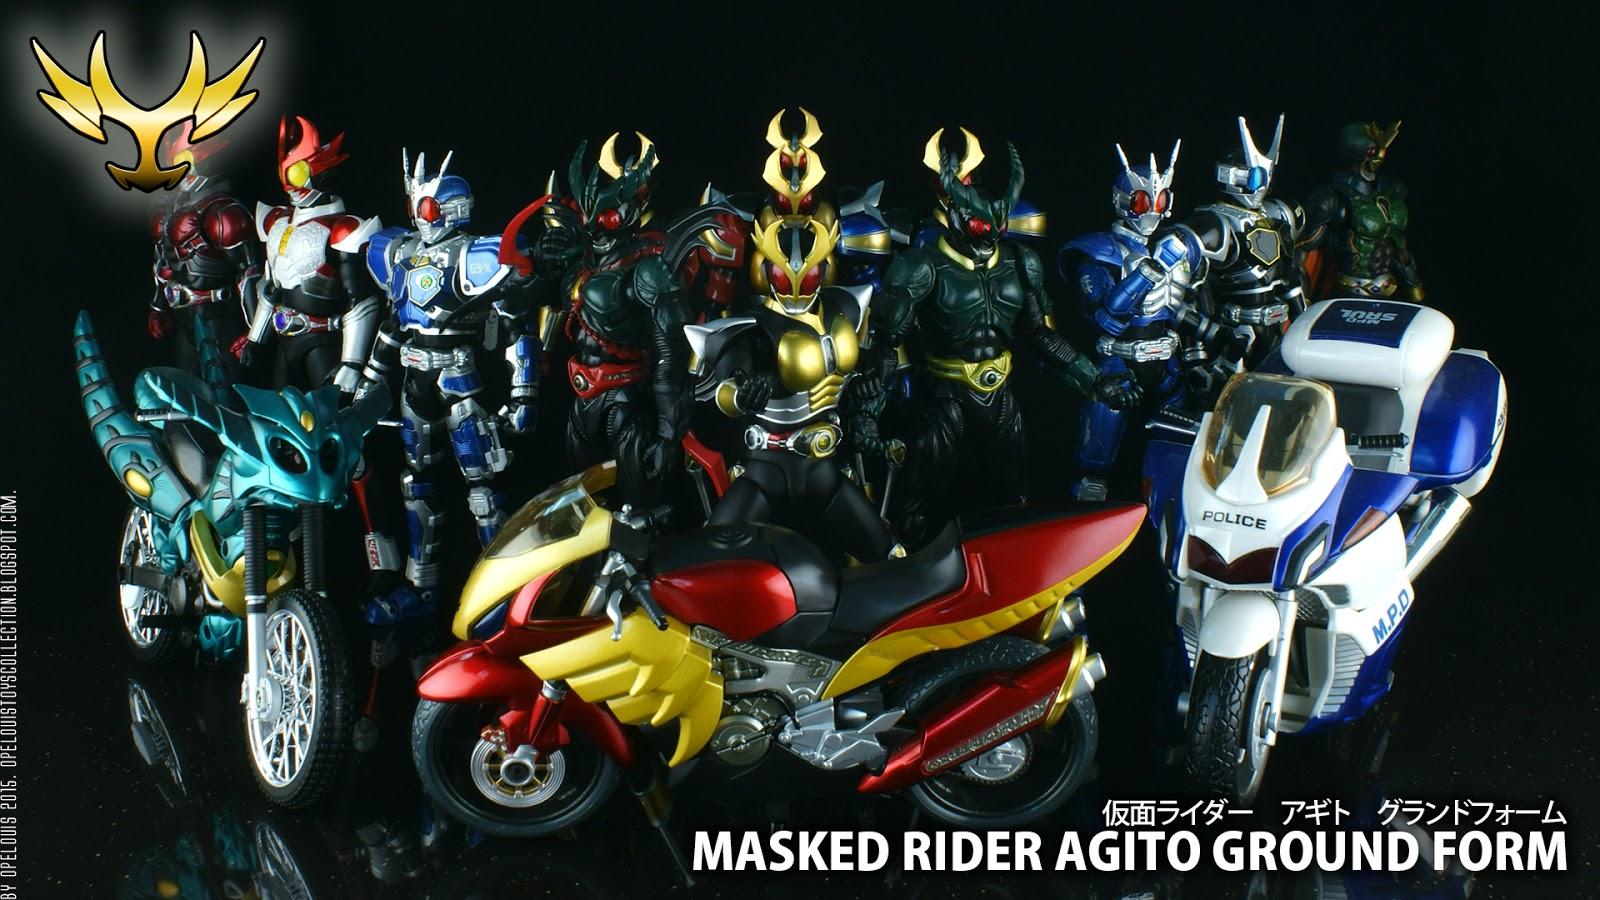 Kamen rider agito episode 4 part 1 - Watch tv online tumblr